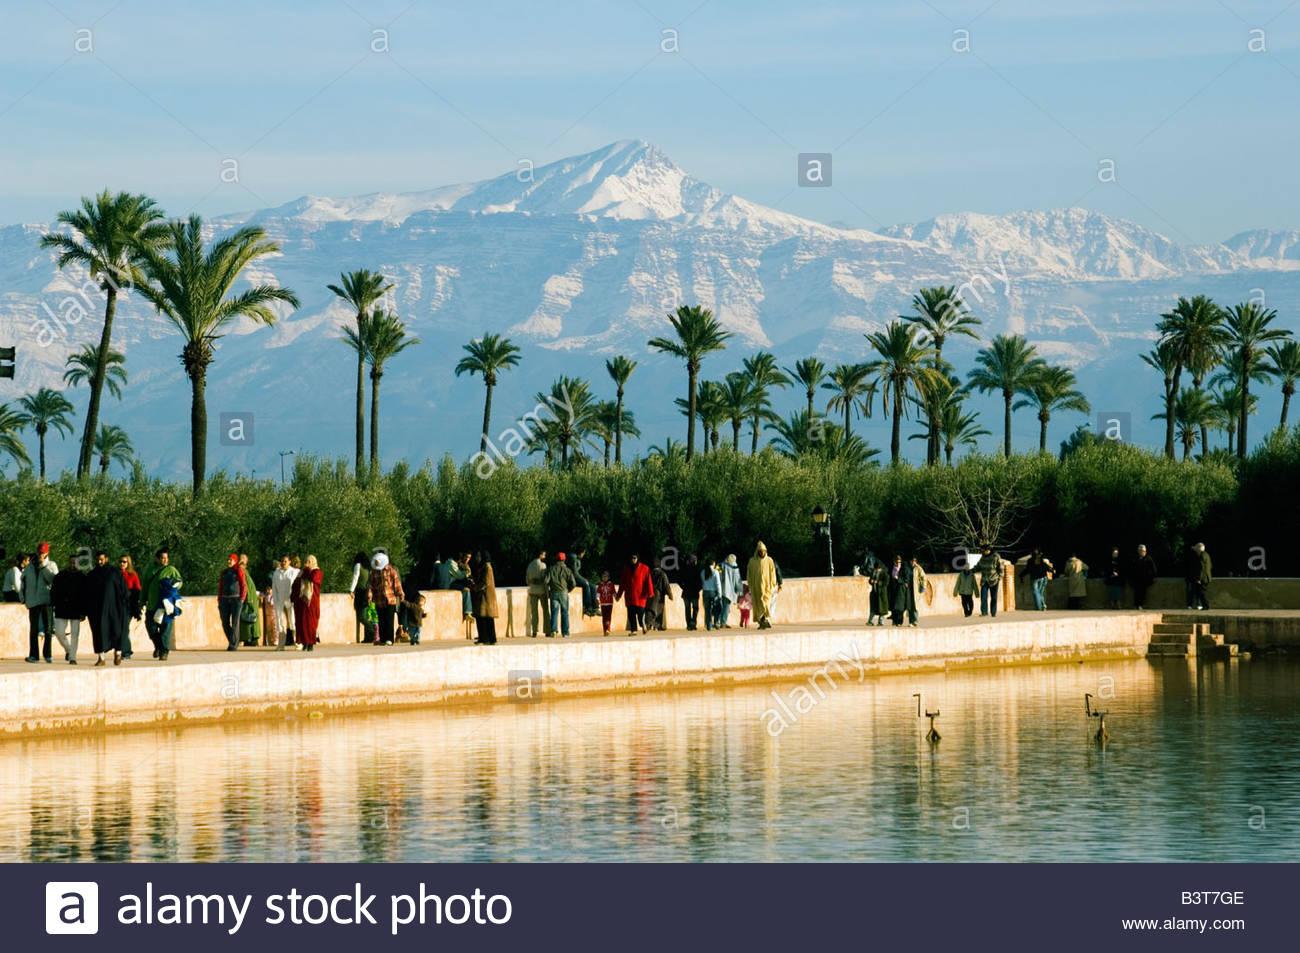 morocco marrakesh menara garden water basin palm trees and snow capped B3T7GE